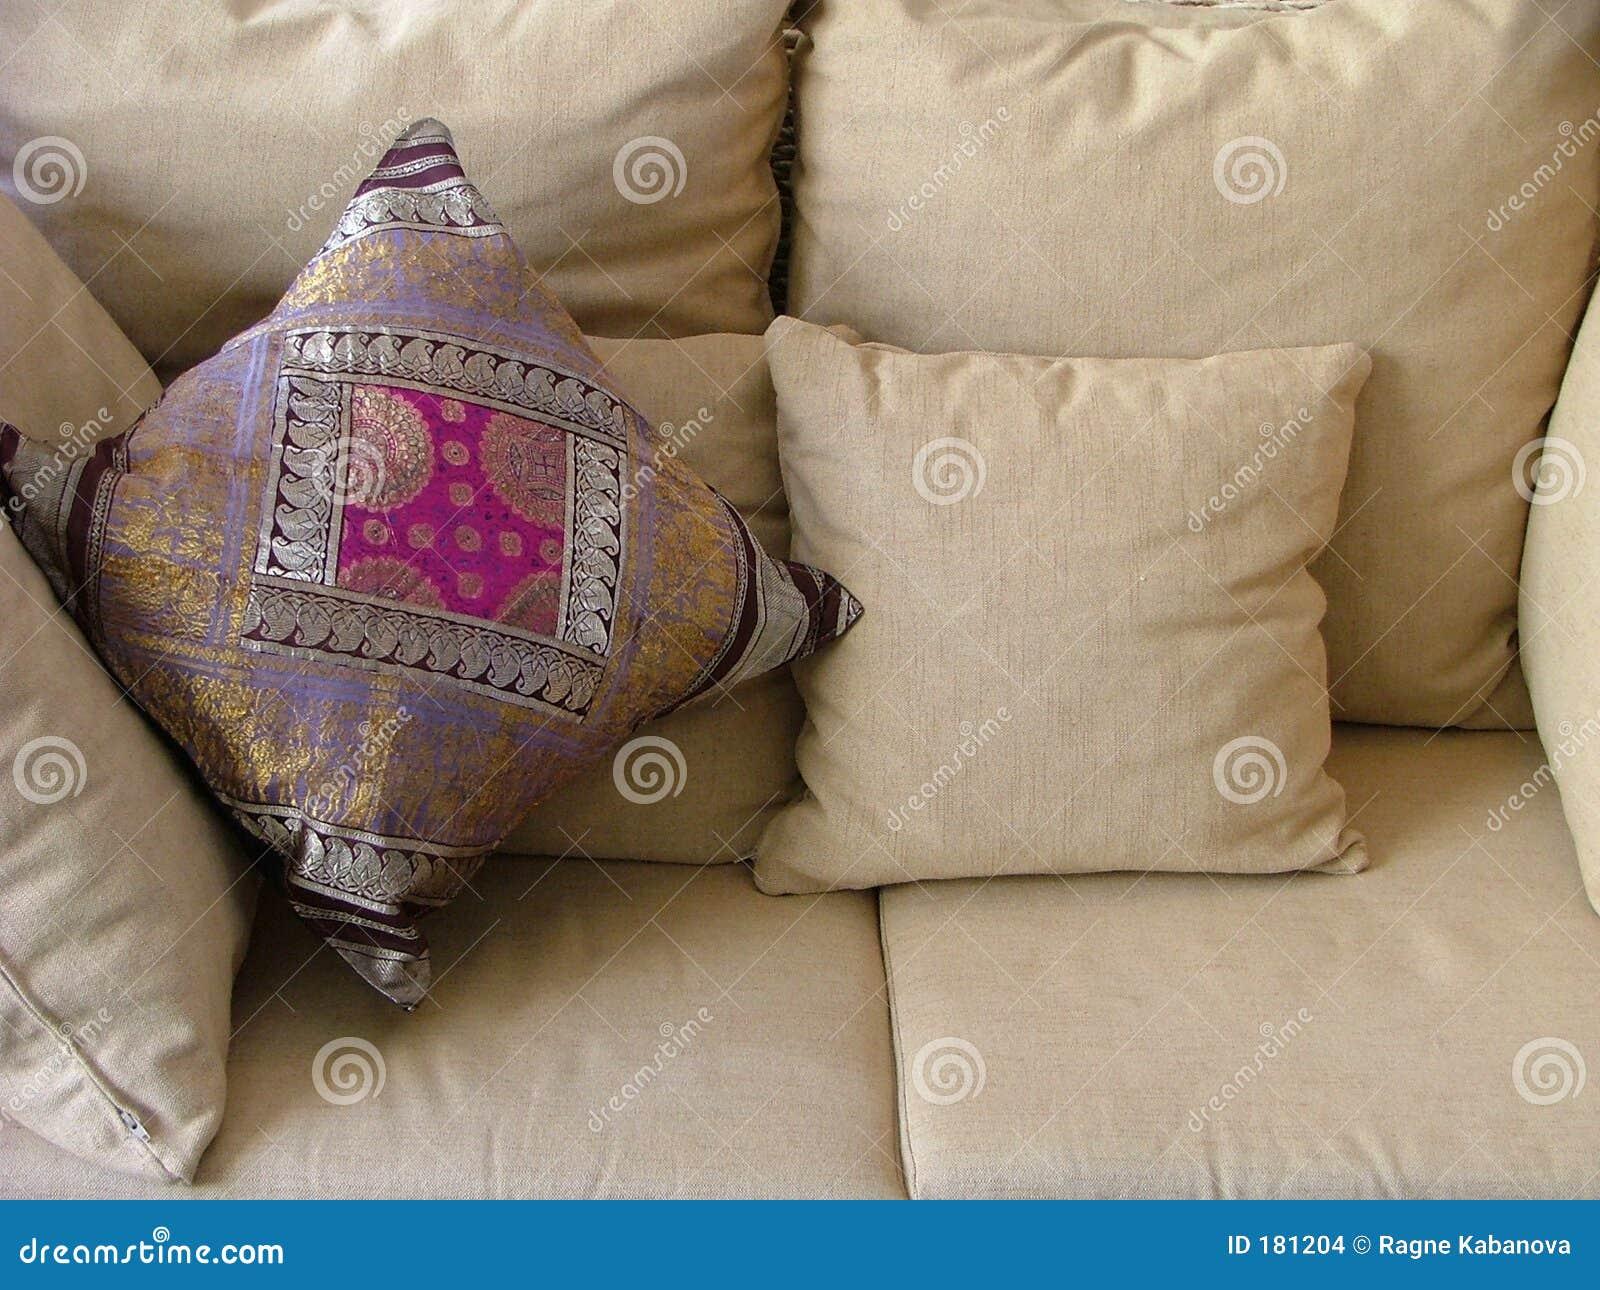 weiches sofa stockbilder bild 181204. Black Bedroom Furniture Sets. Home Design Ideas